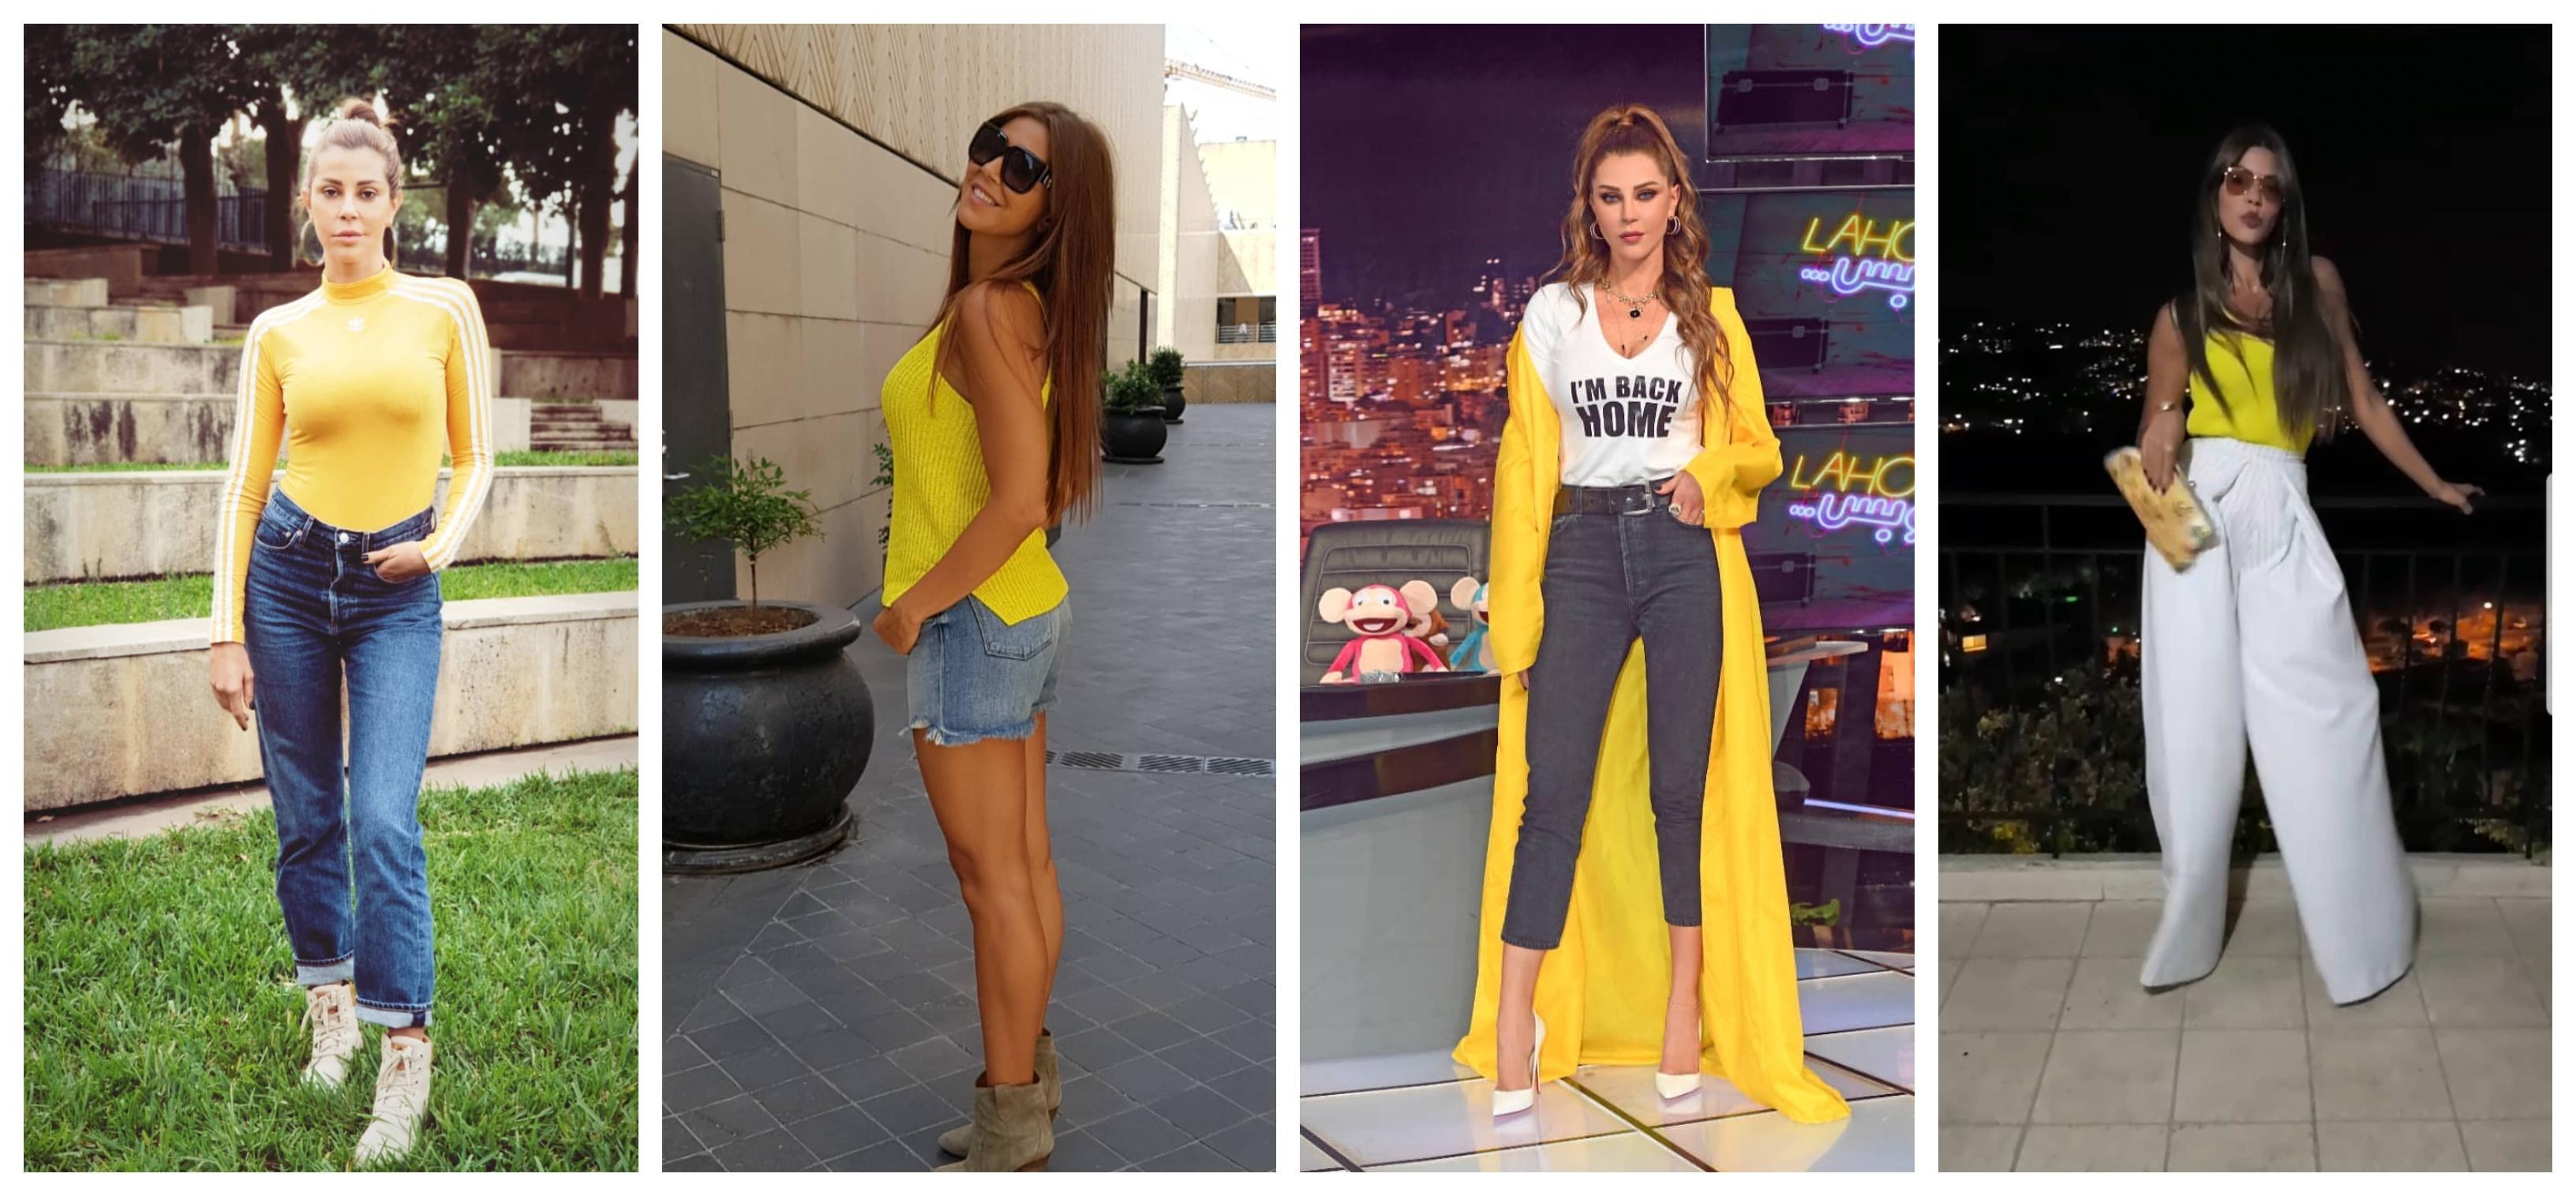 b42268886972d اعتمدي اللون الأصفر على طريقة كارلا حداد (صور) - Lebanon News